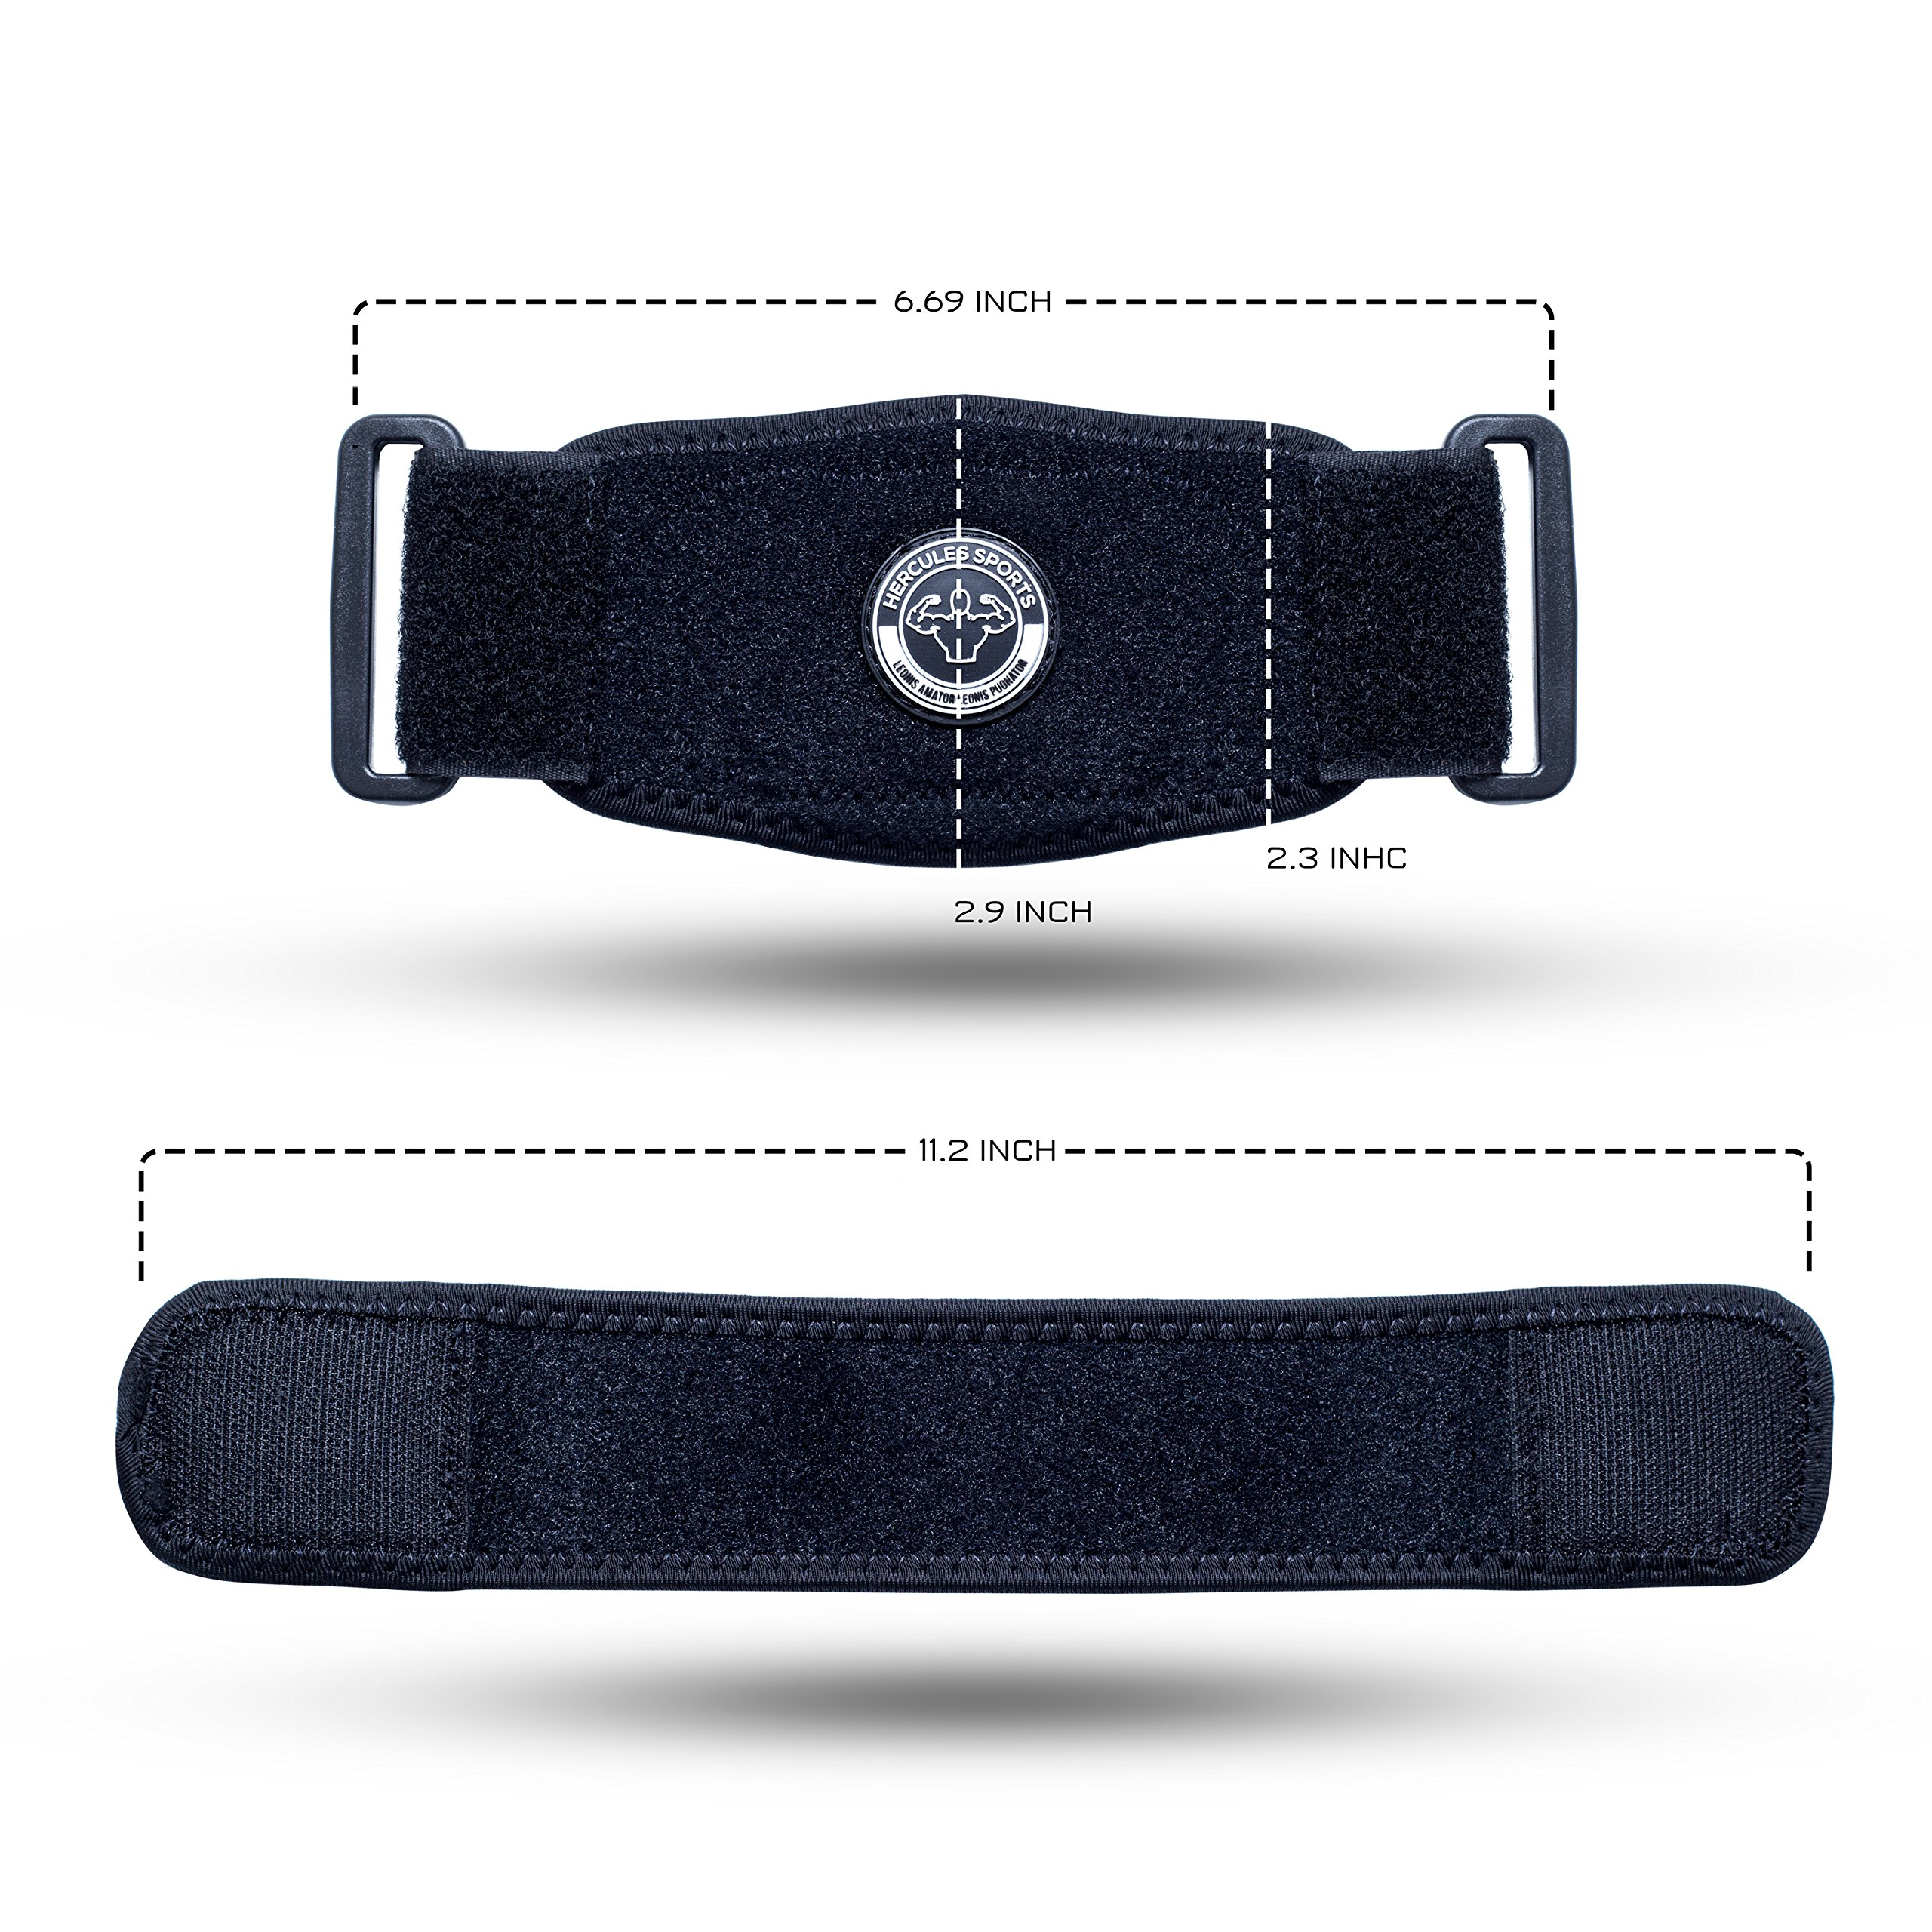 Medical Golfer's & Tennis Elbow brace (2-pack) BONUS Wrist sweatband & Resistance Band quick effective recovery Pain Relief System w/ Compression Pad Tendonitis, Versatile support MEN & WOMEN (Black)